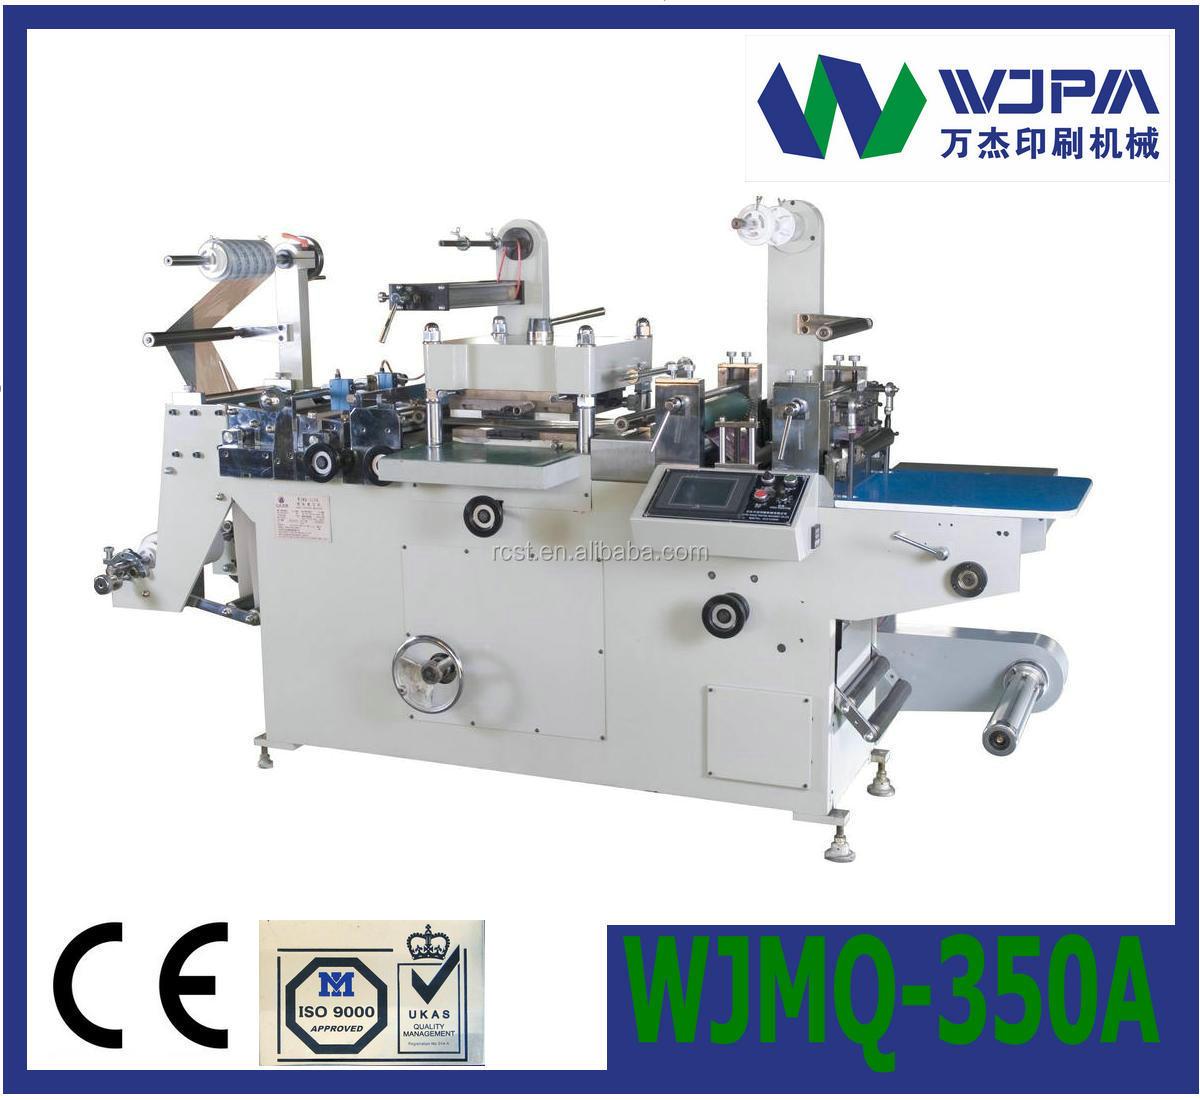 WJMQ350 Automatic Label Die-cutting Machine